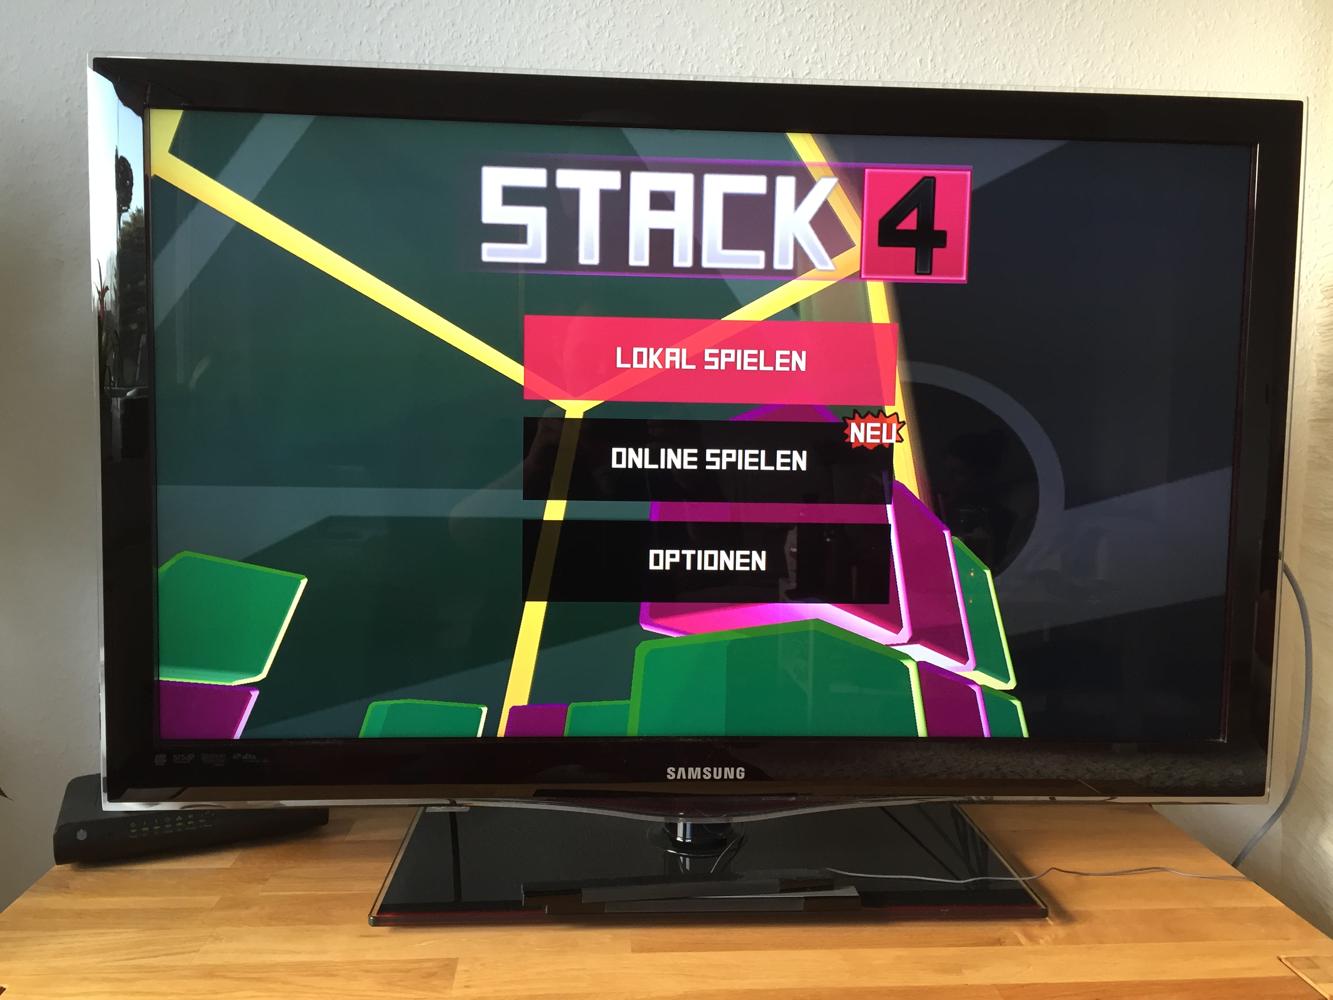 STACK4 firetv